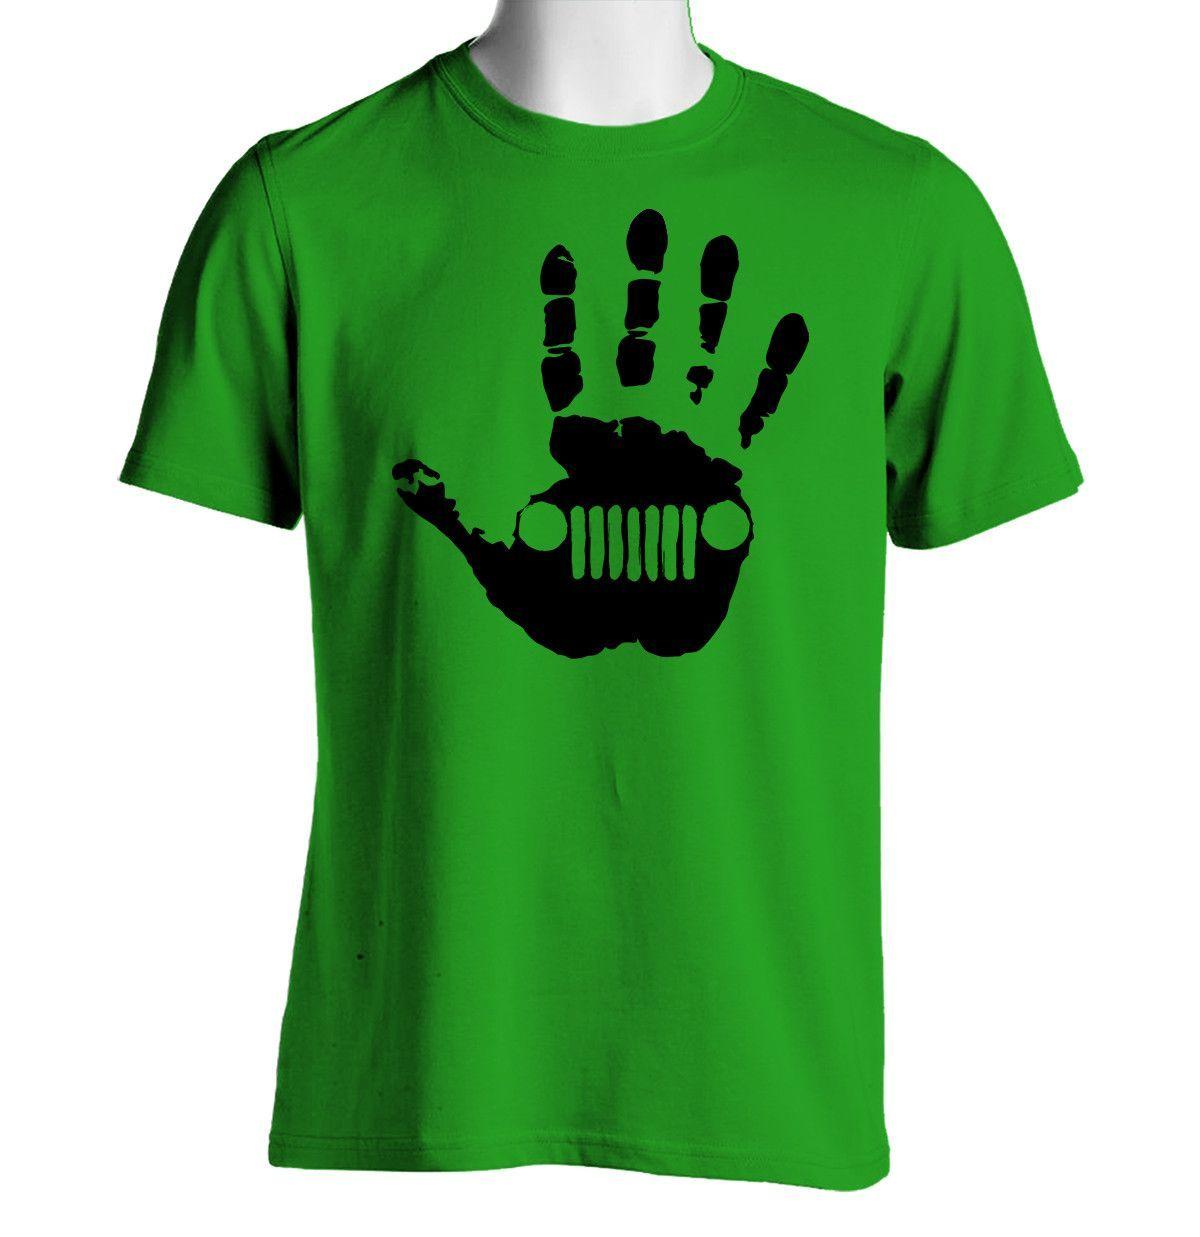 Jeep Hand Print T-Shirt